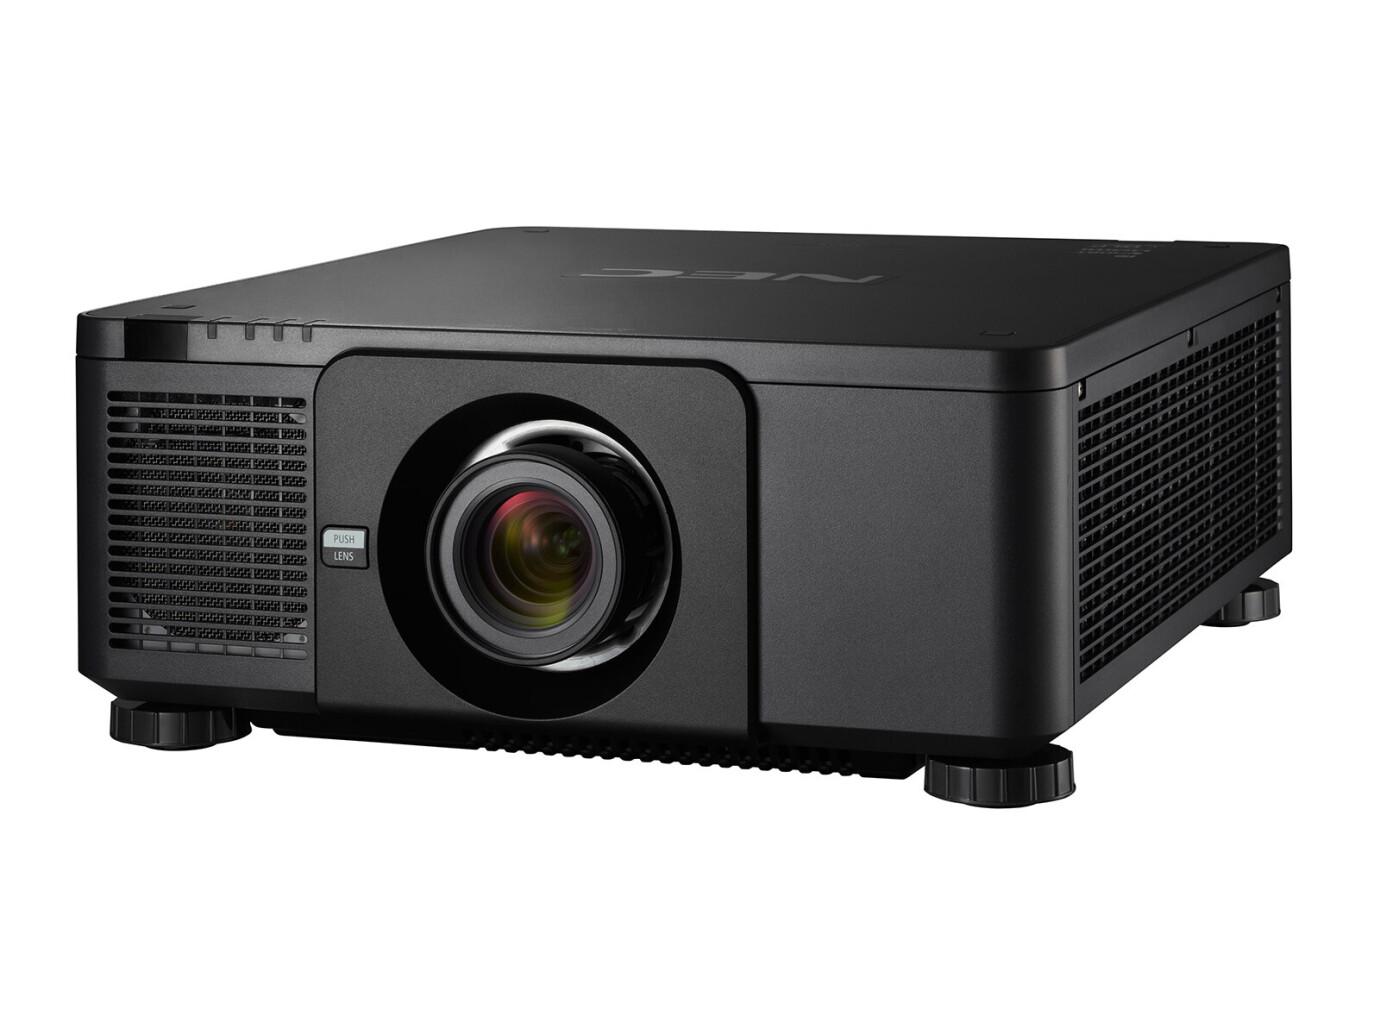 NEC PX1004UL-BK (without lens)